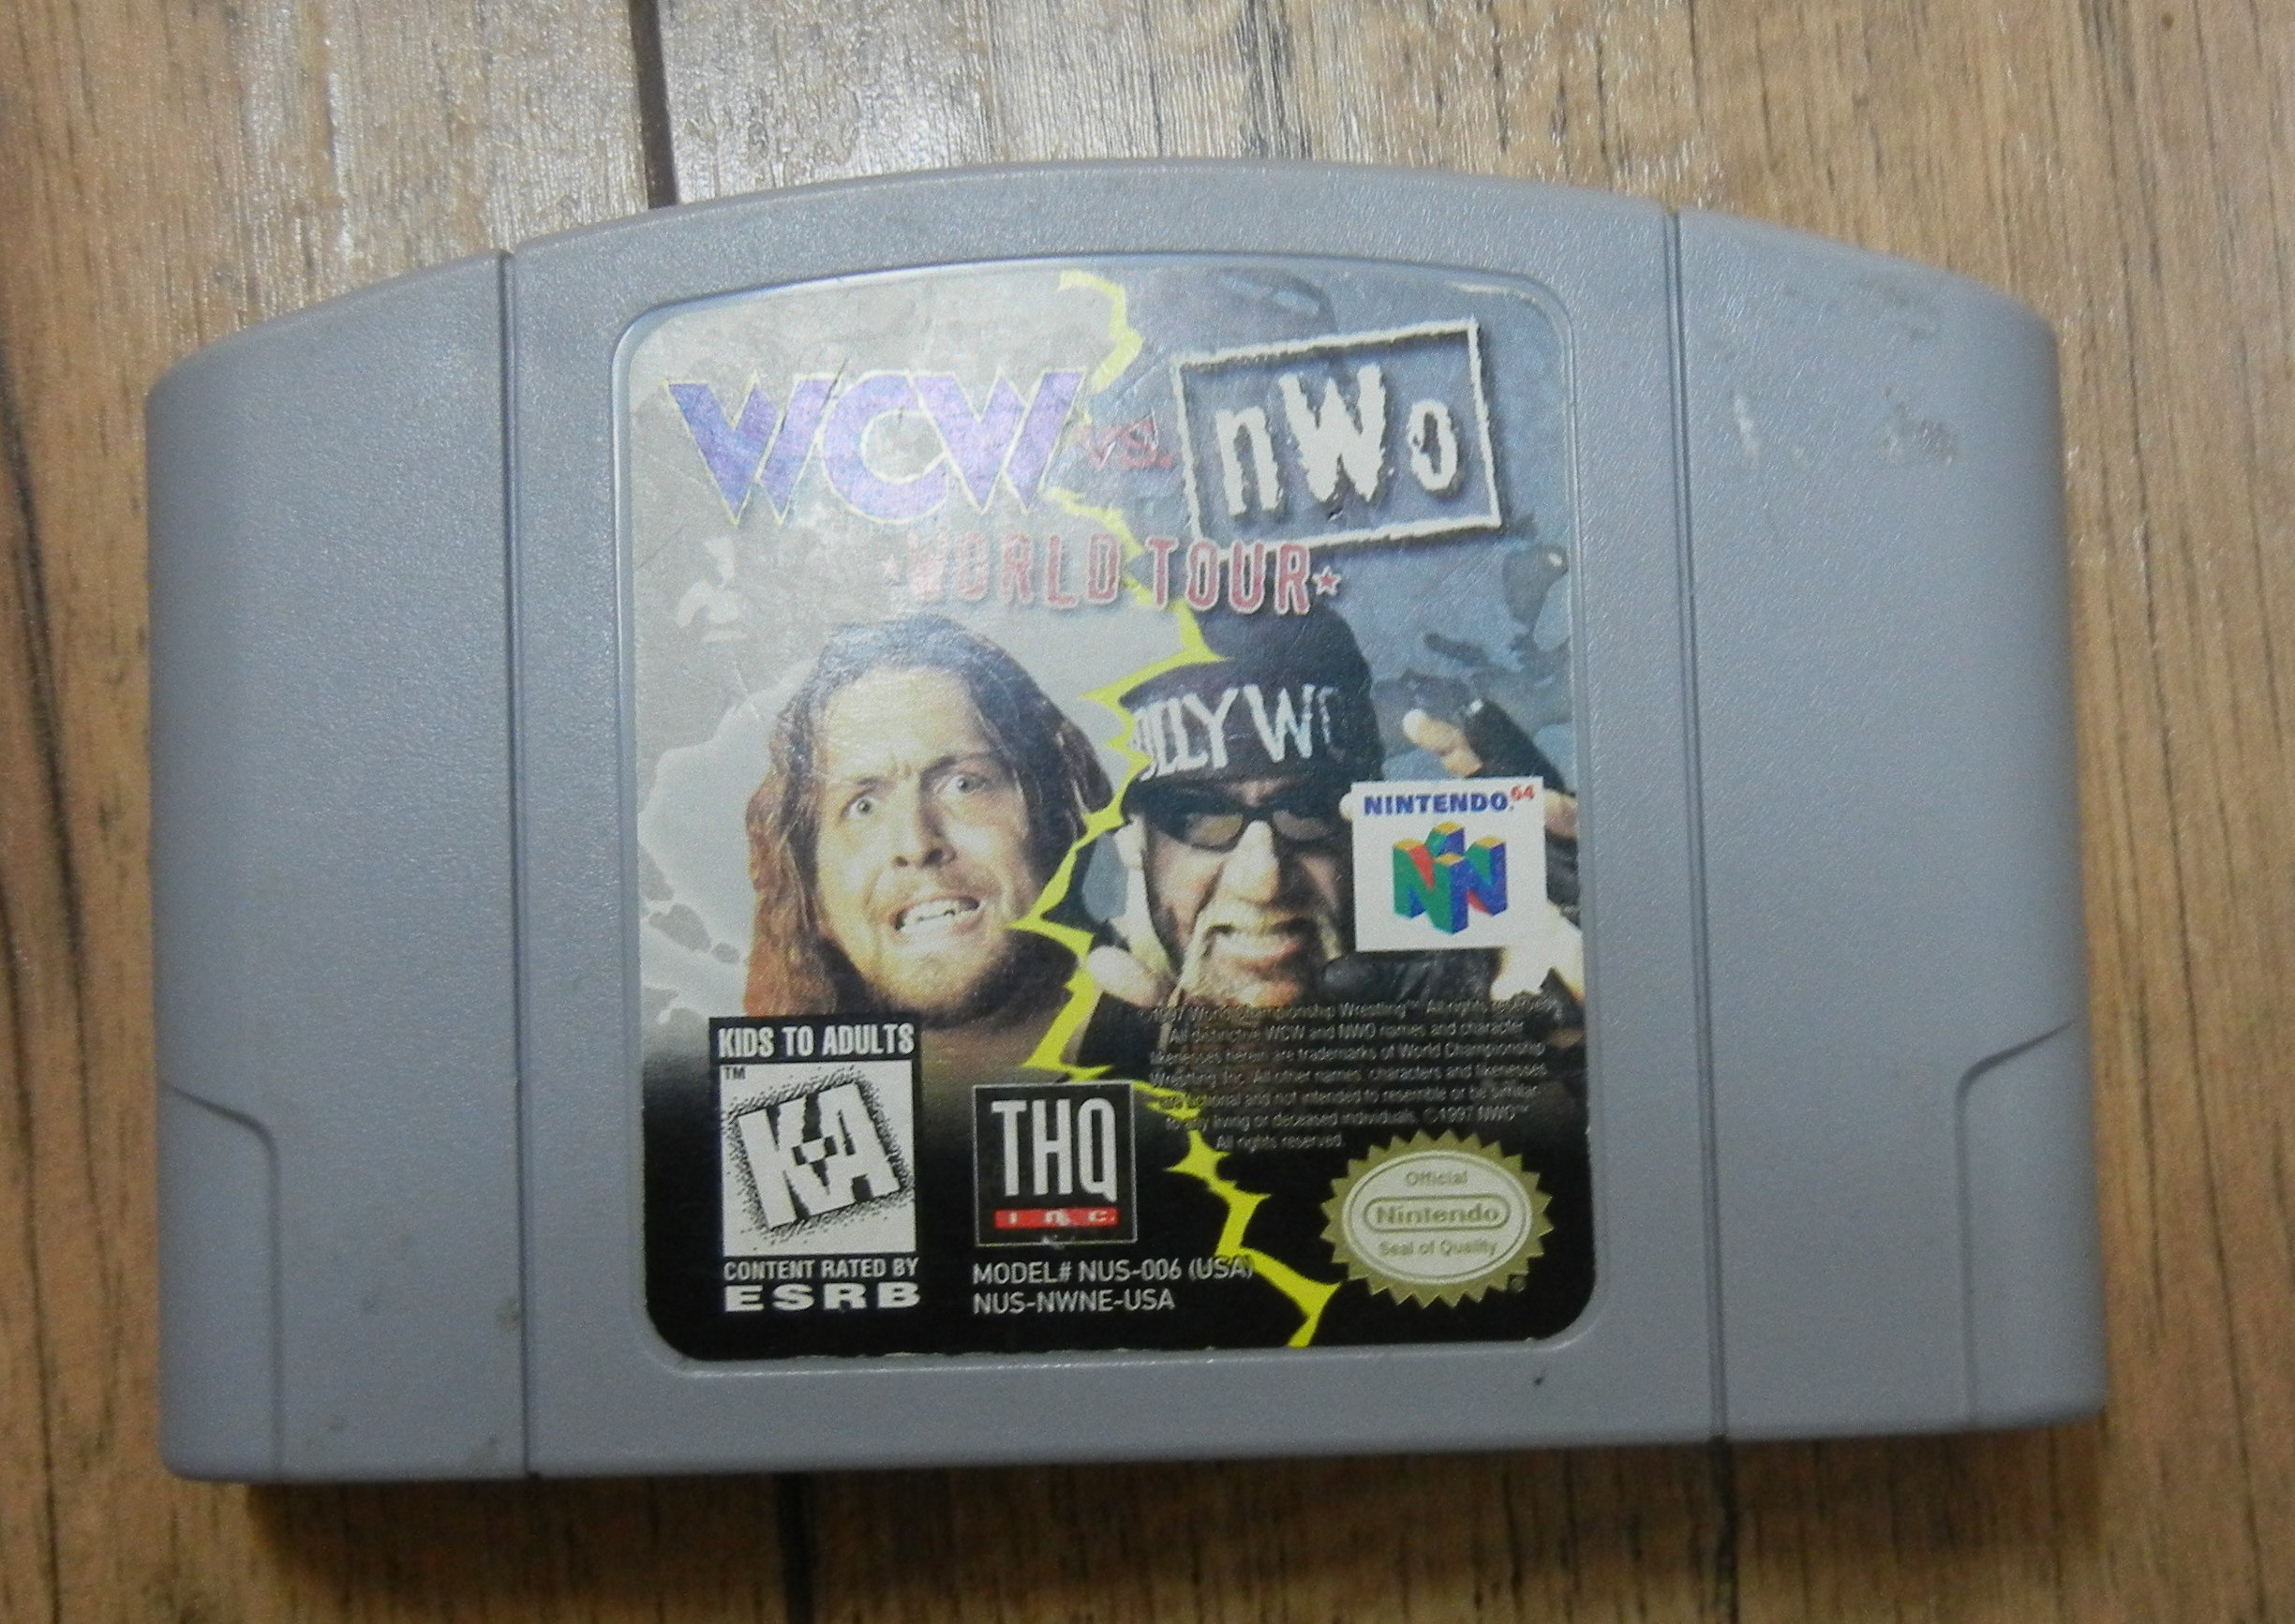 N64 WRESTLING WCW NWO WROLD TOUR